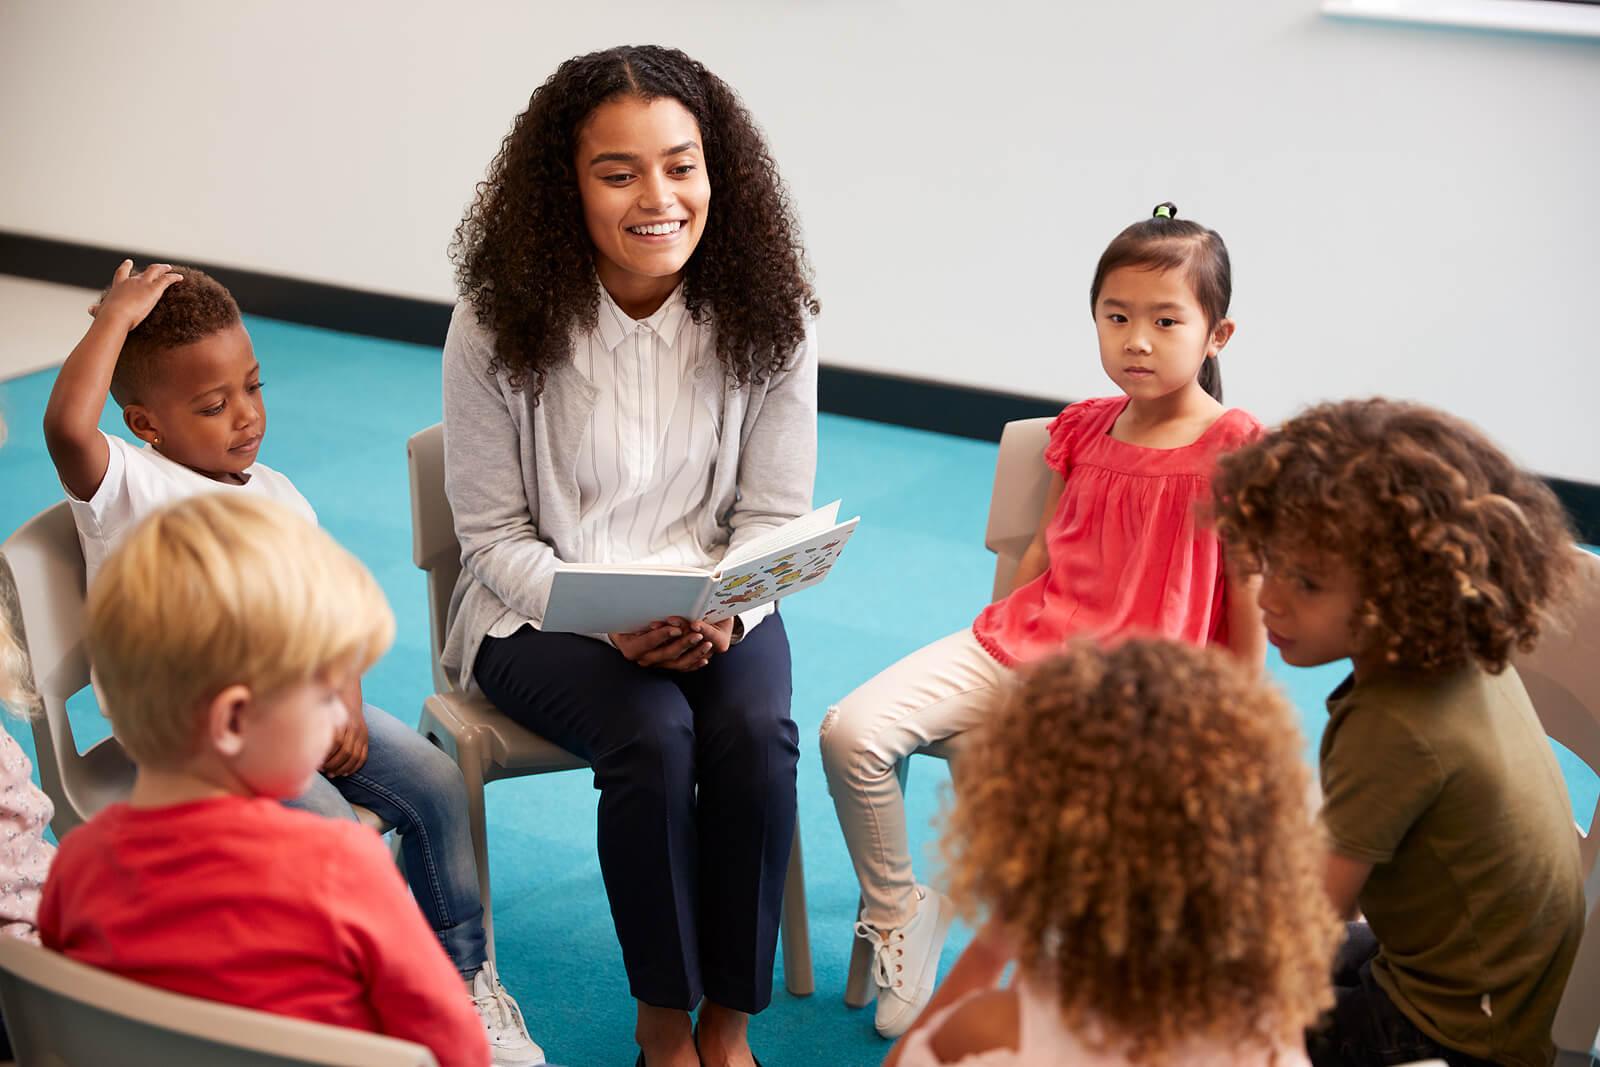 Profesora en clase con sus alumnos usando técnicas para formar grupos.